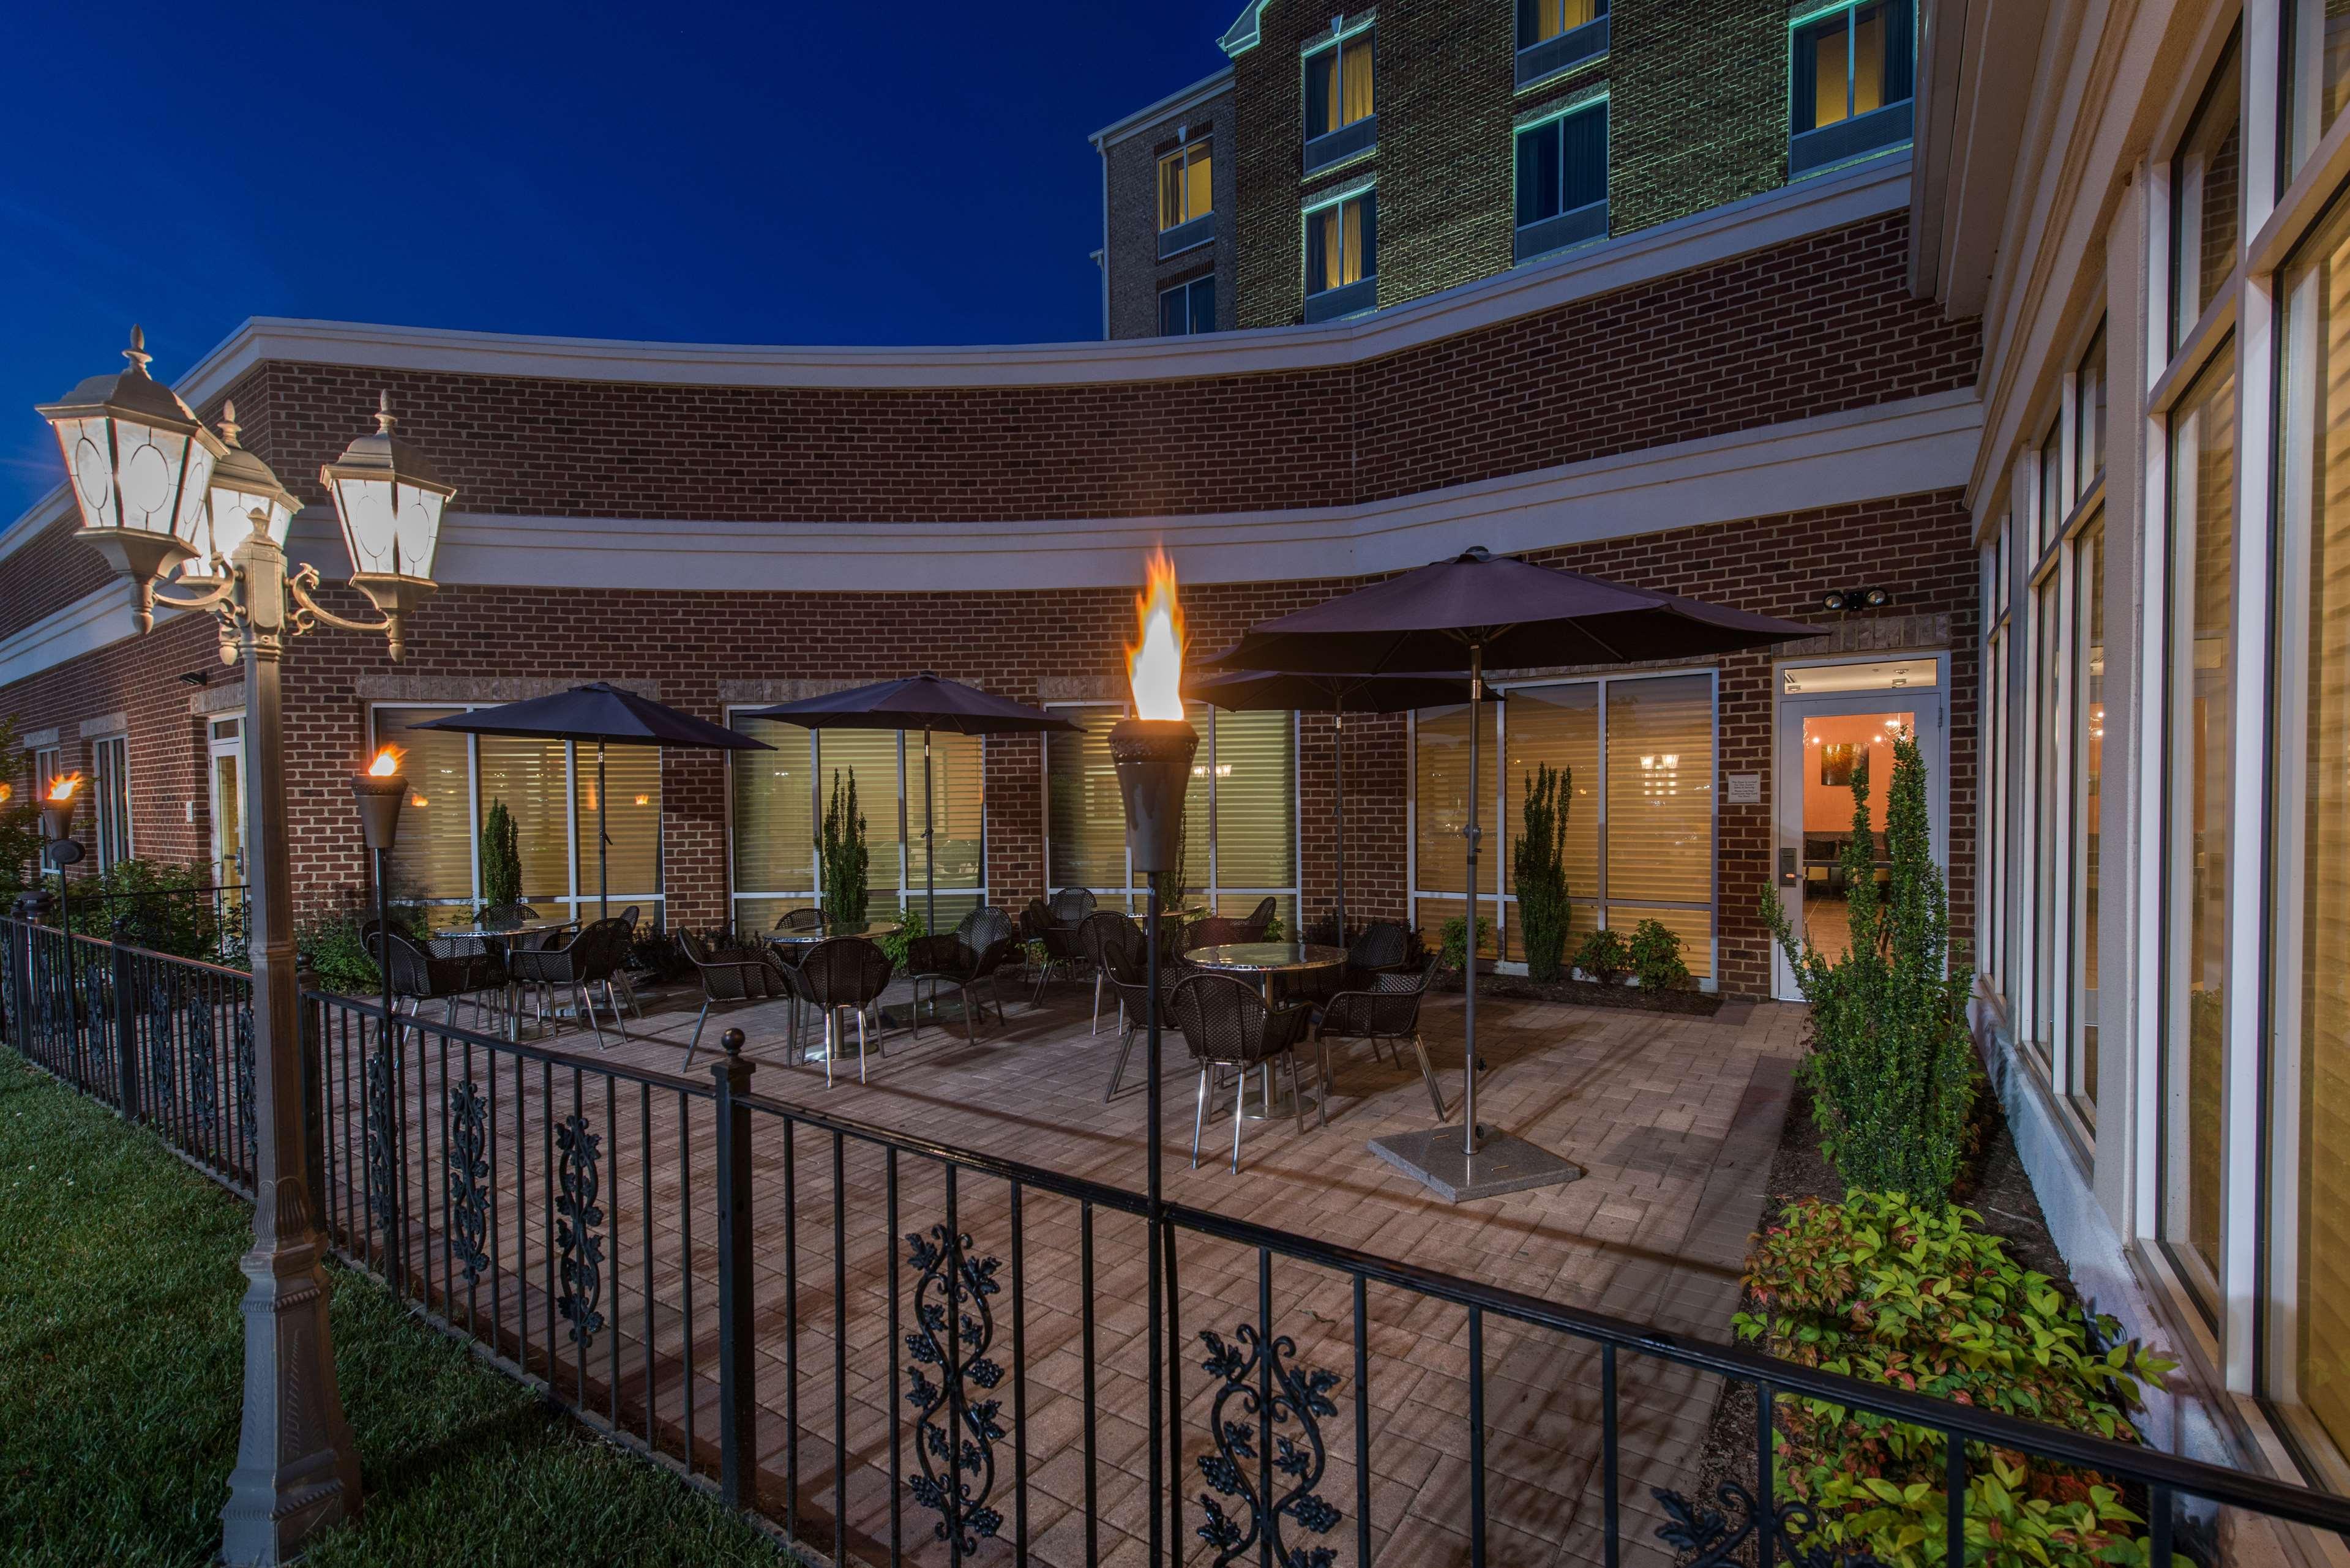 Hilton Garden Inn Lynchburg image 1